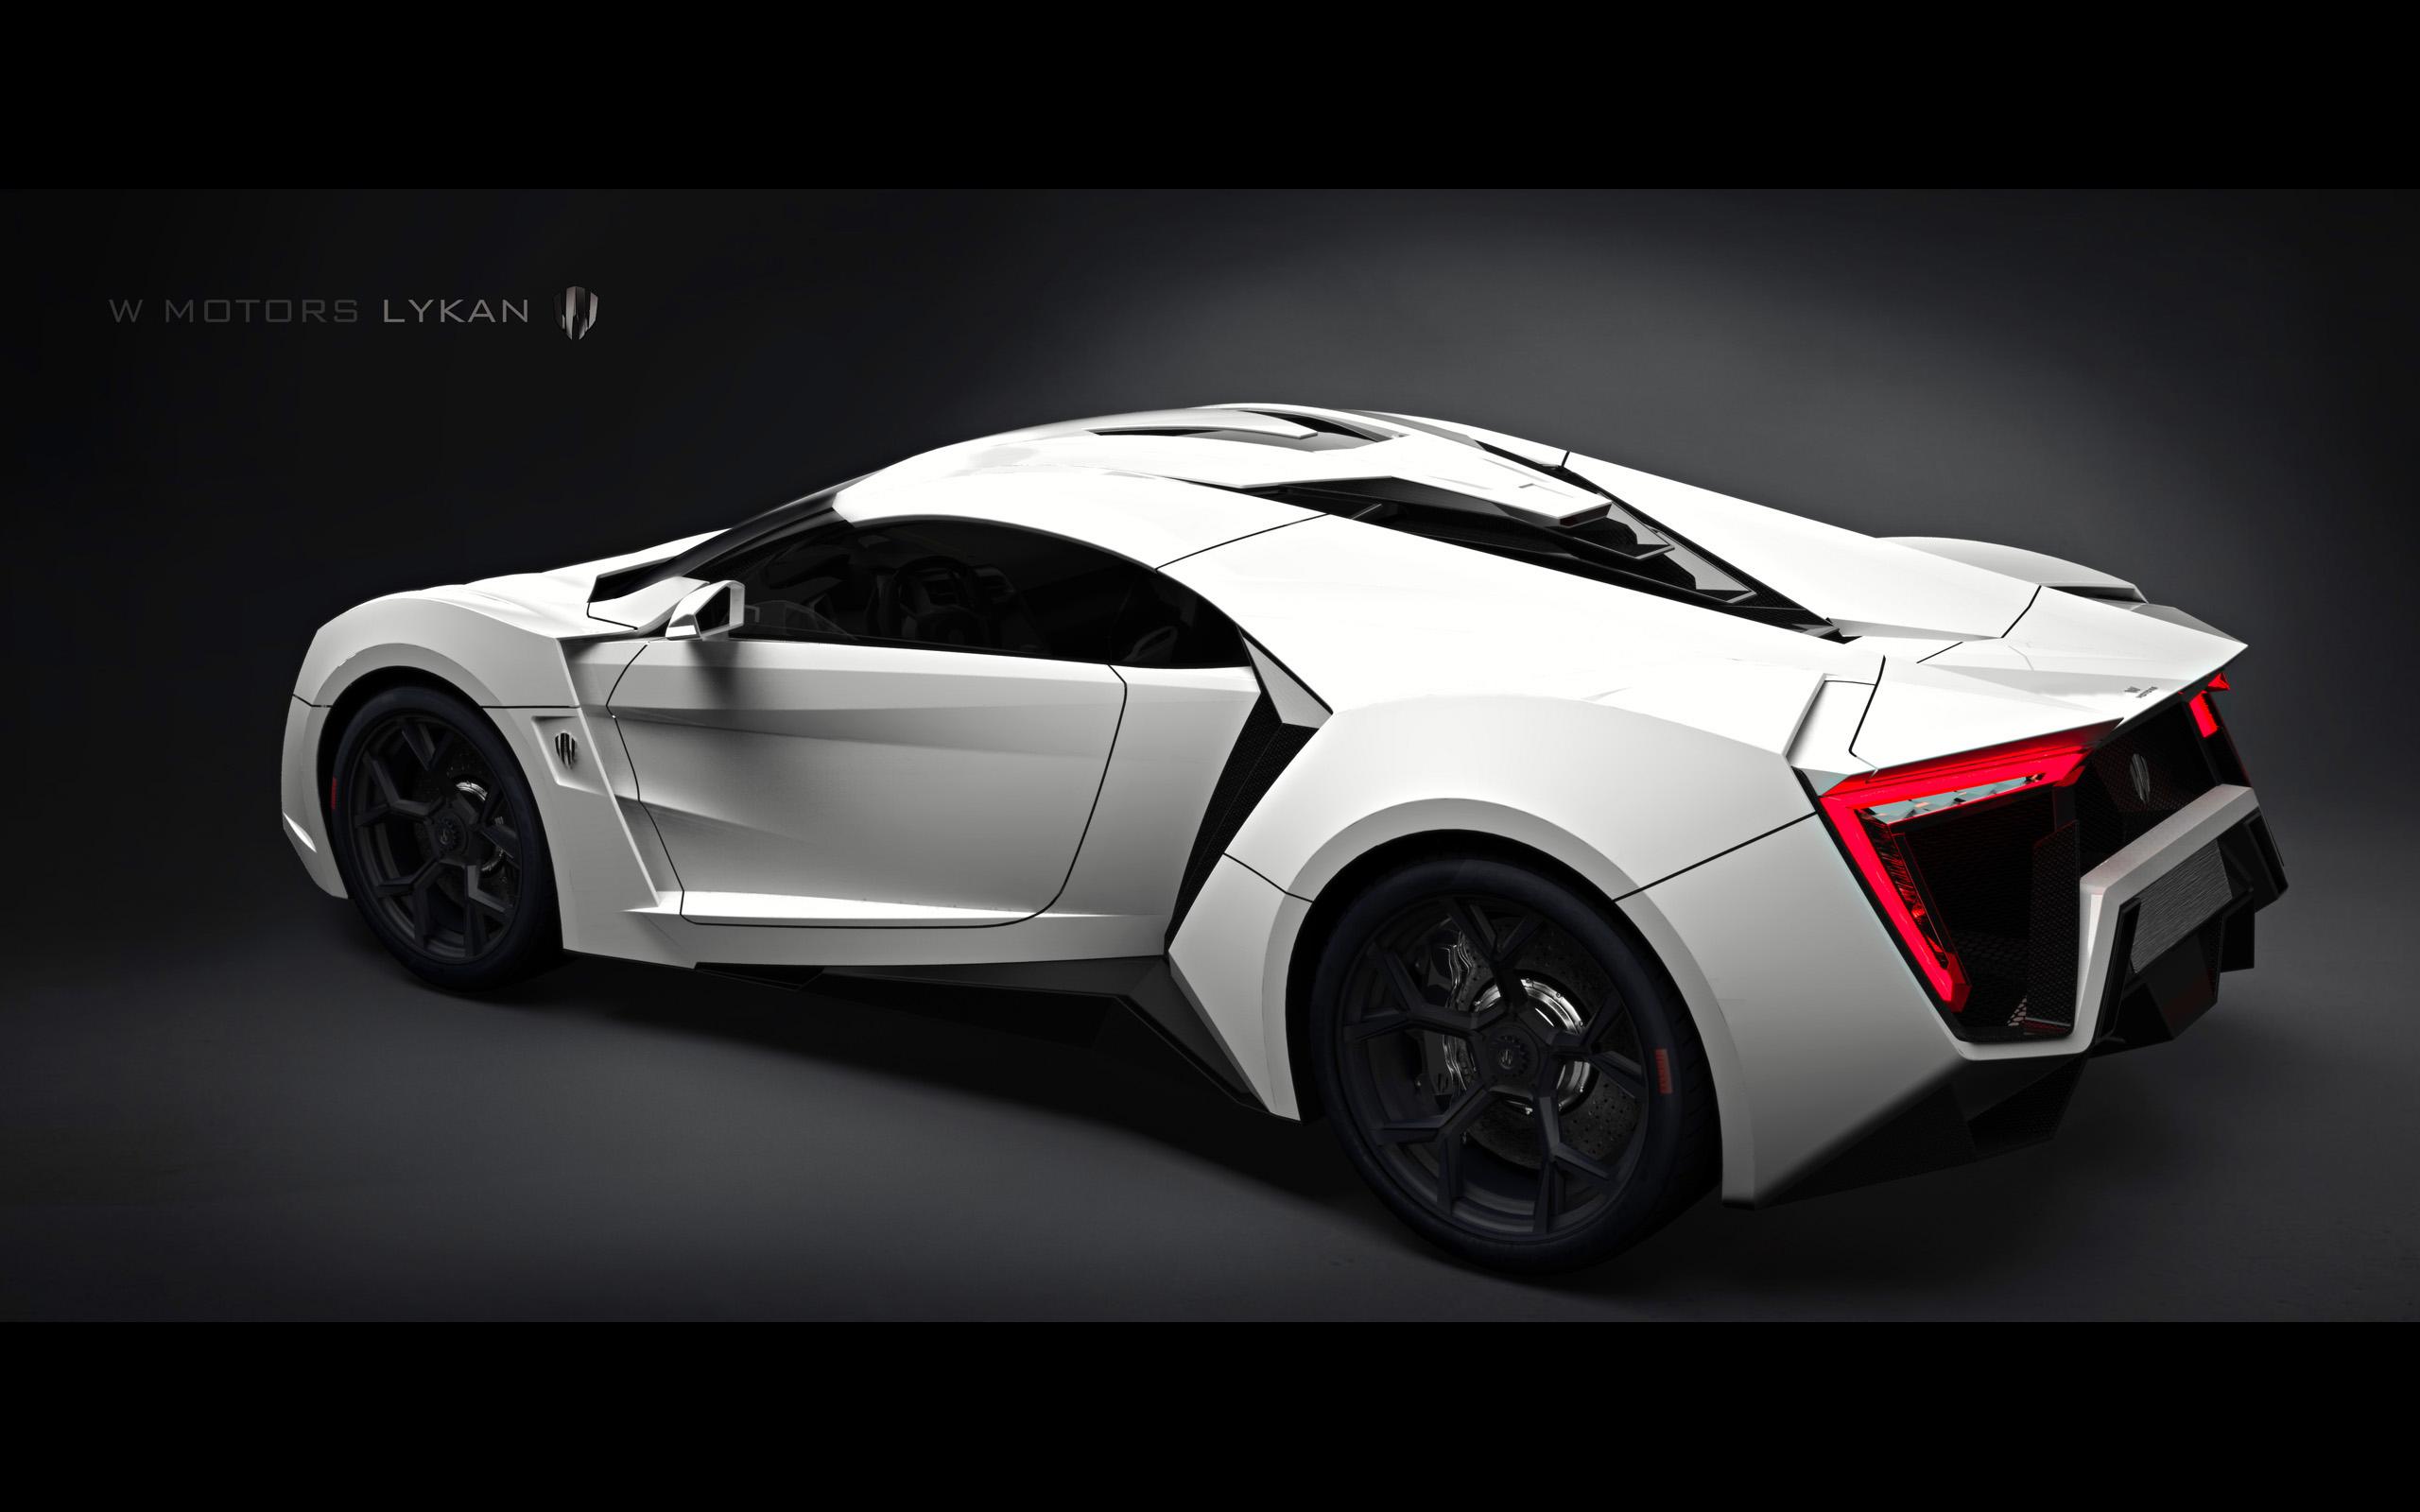 2013 Lykan Hypersport supercar supercars h wallpaper 2560x1600 2560x1600